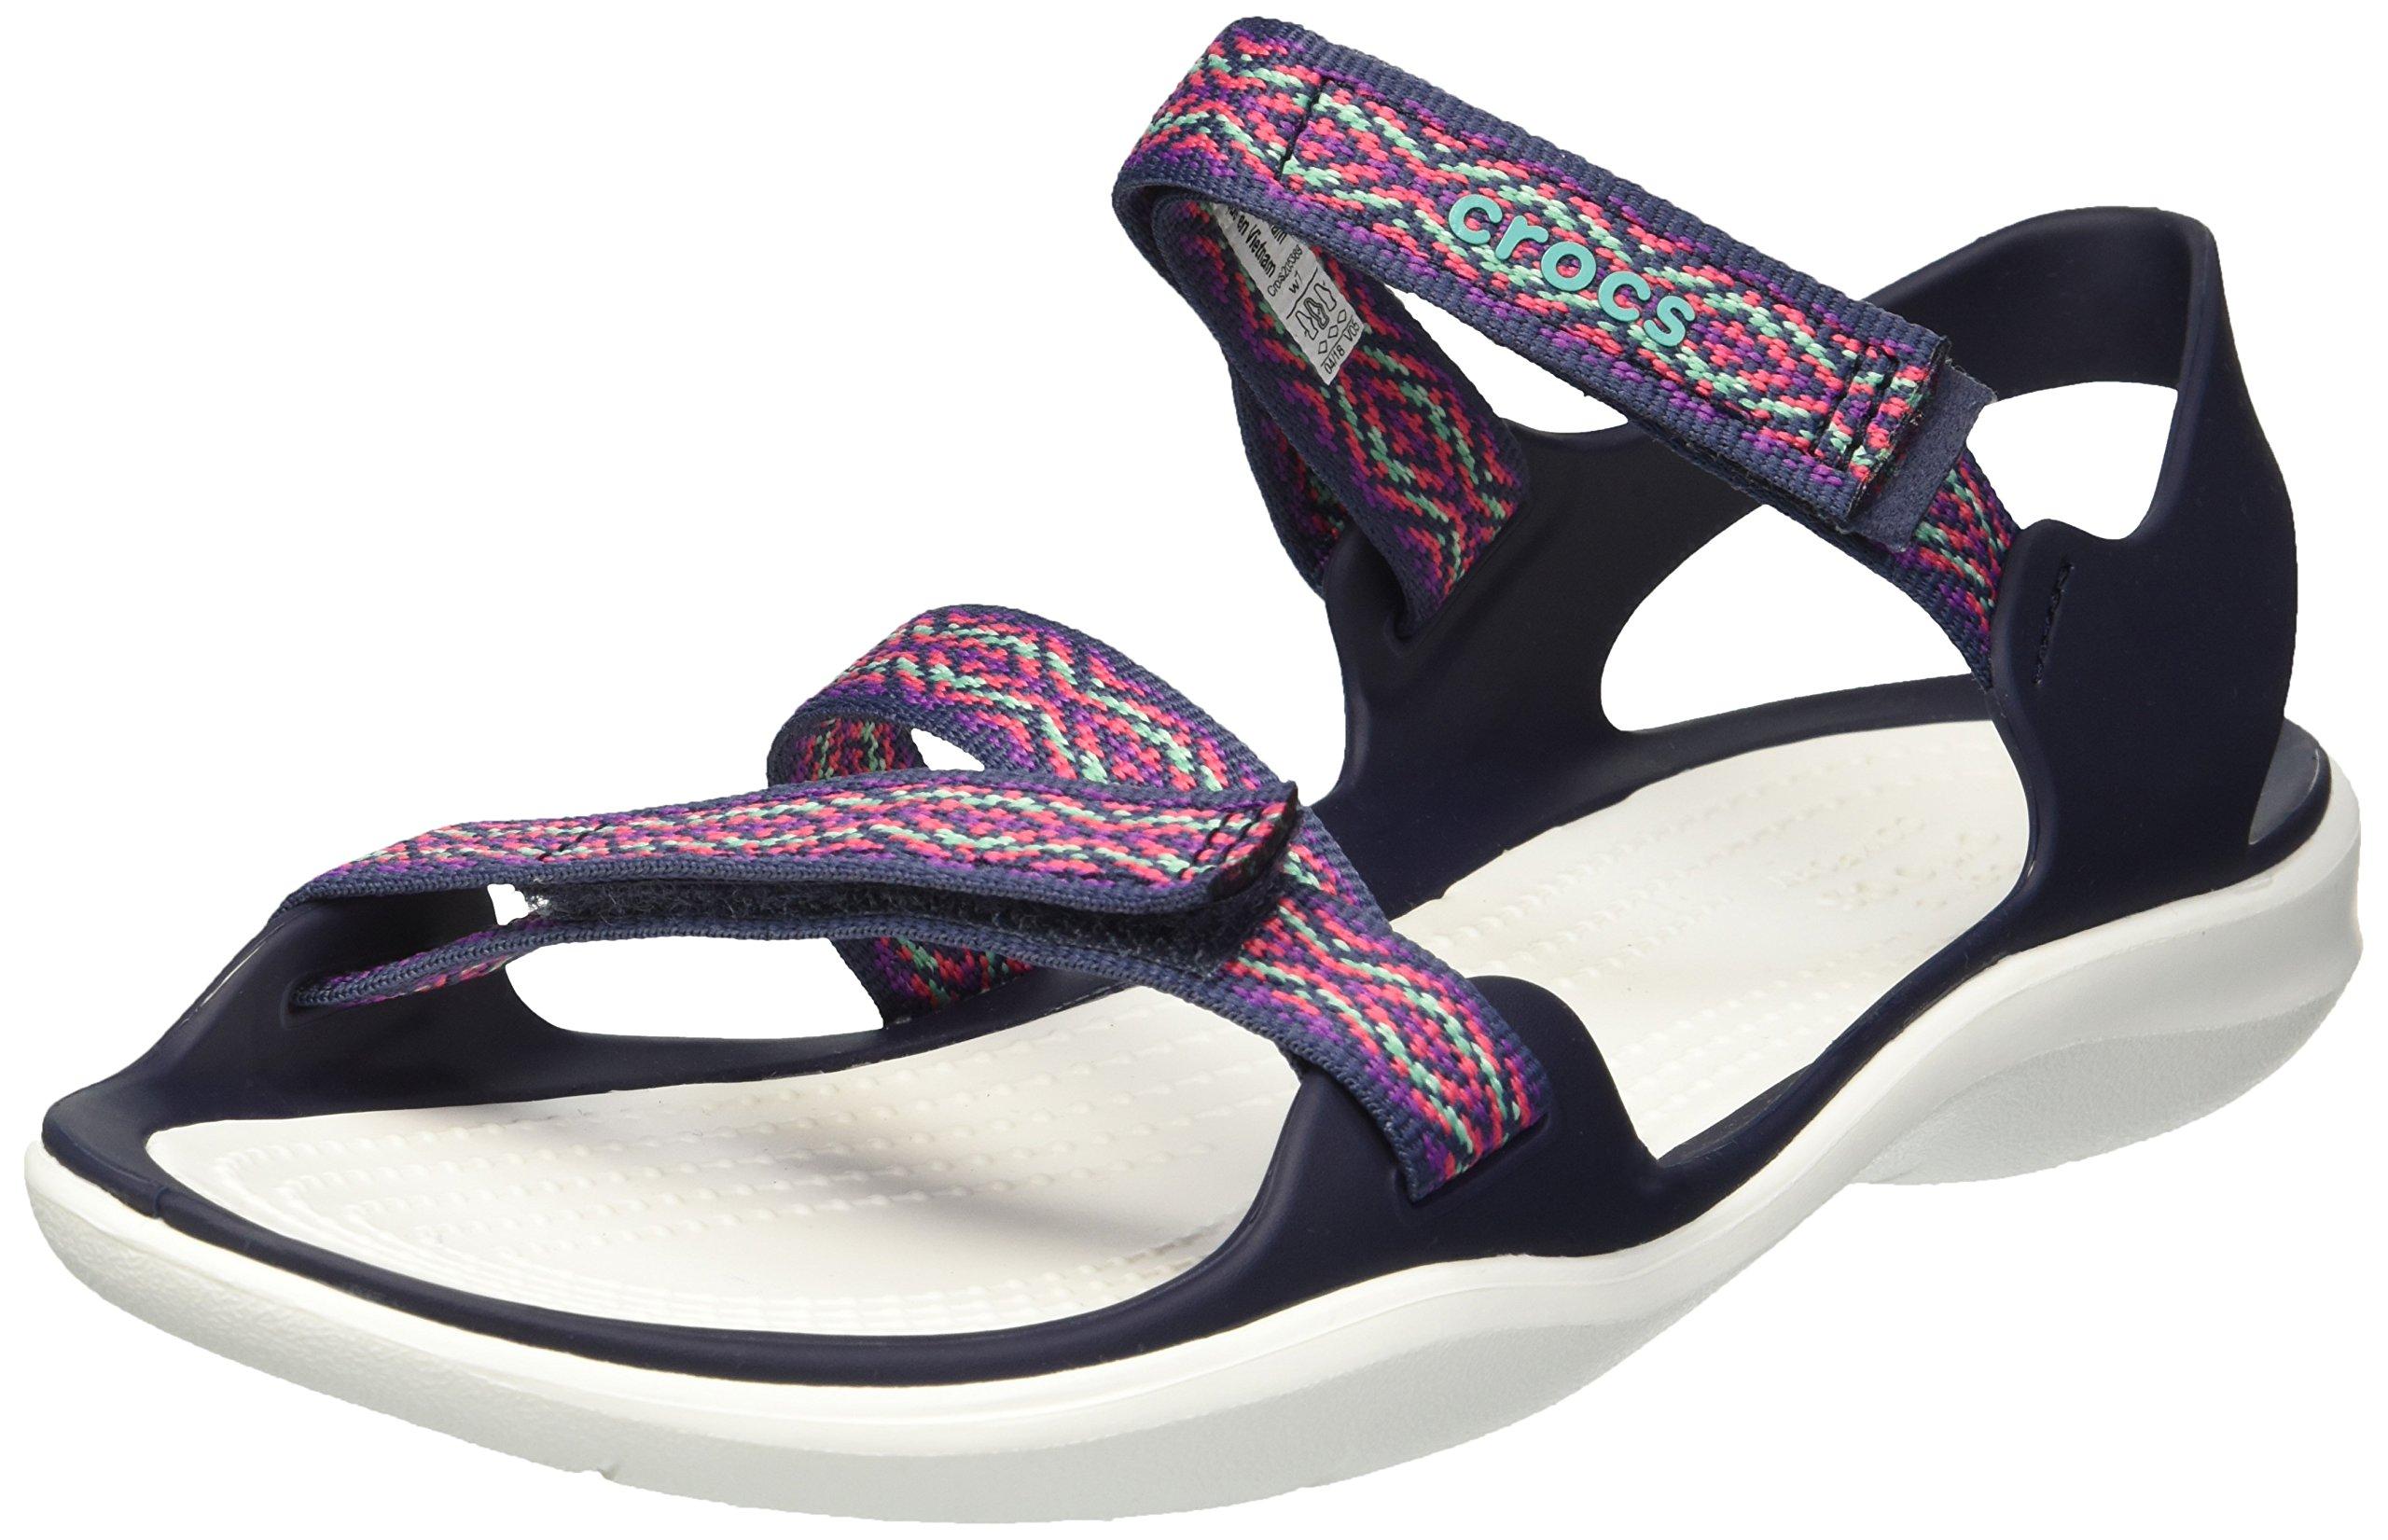 Crocs Women's Swiftwater Graph Webbing Sport Sandal, Navy/Diamond, 8 M US